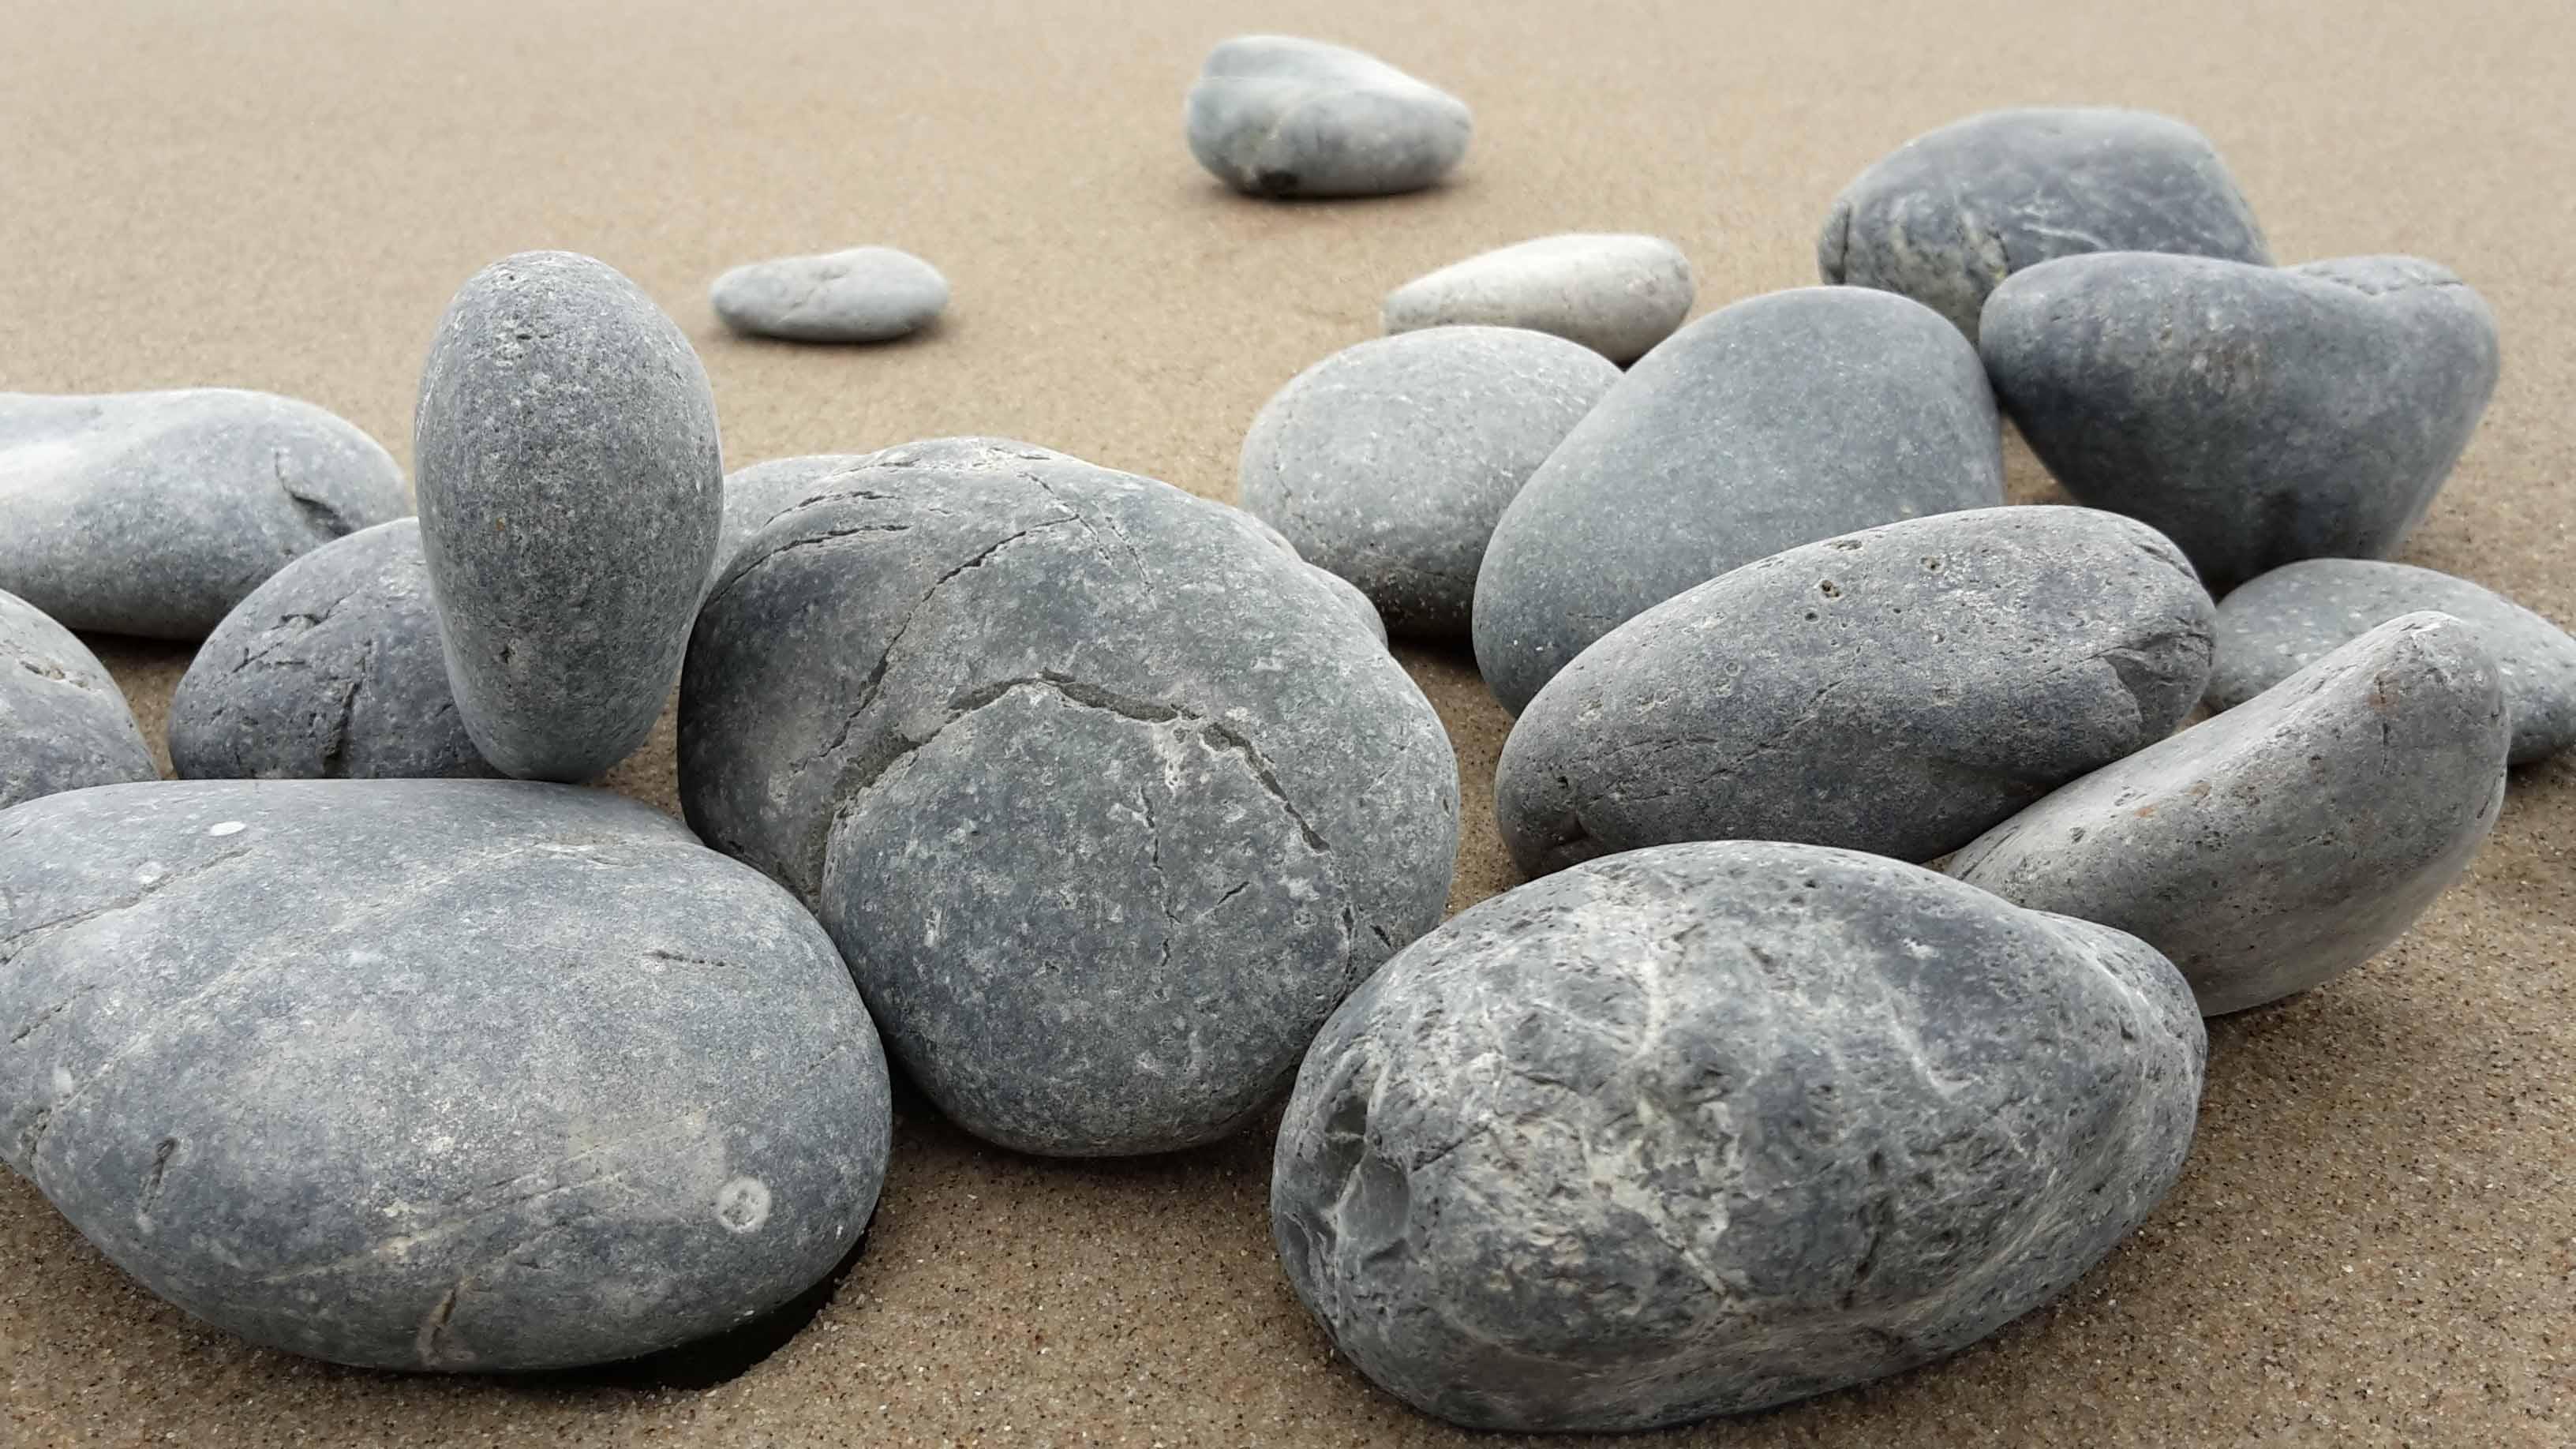 basalt-stones-1037829